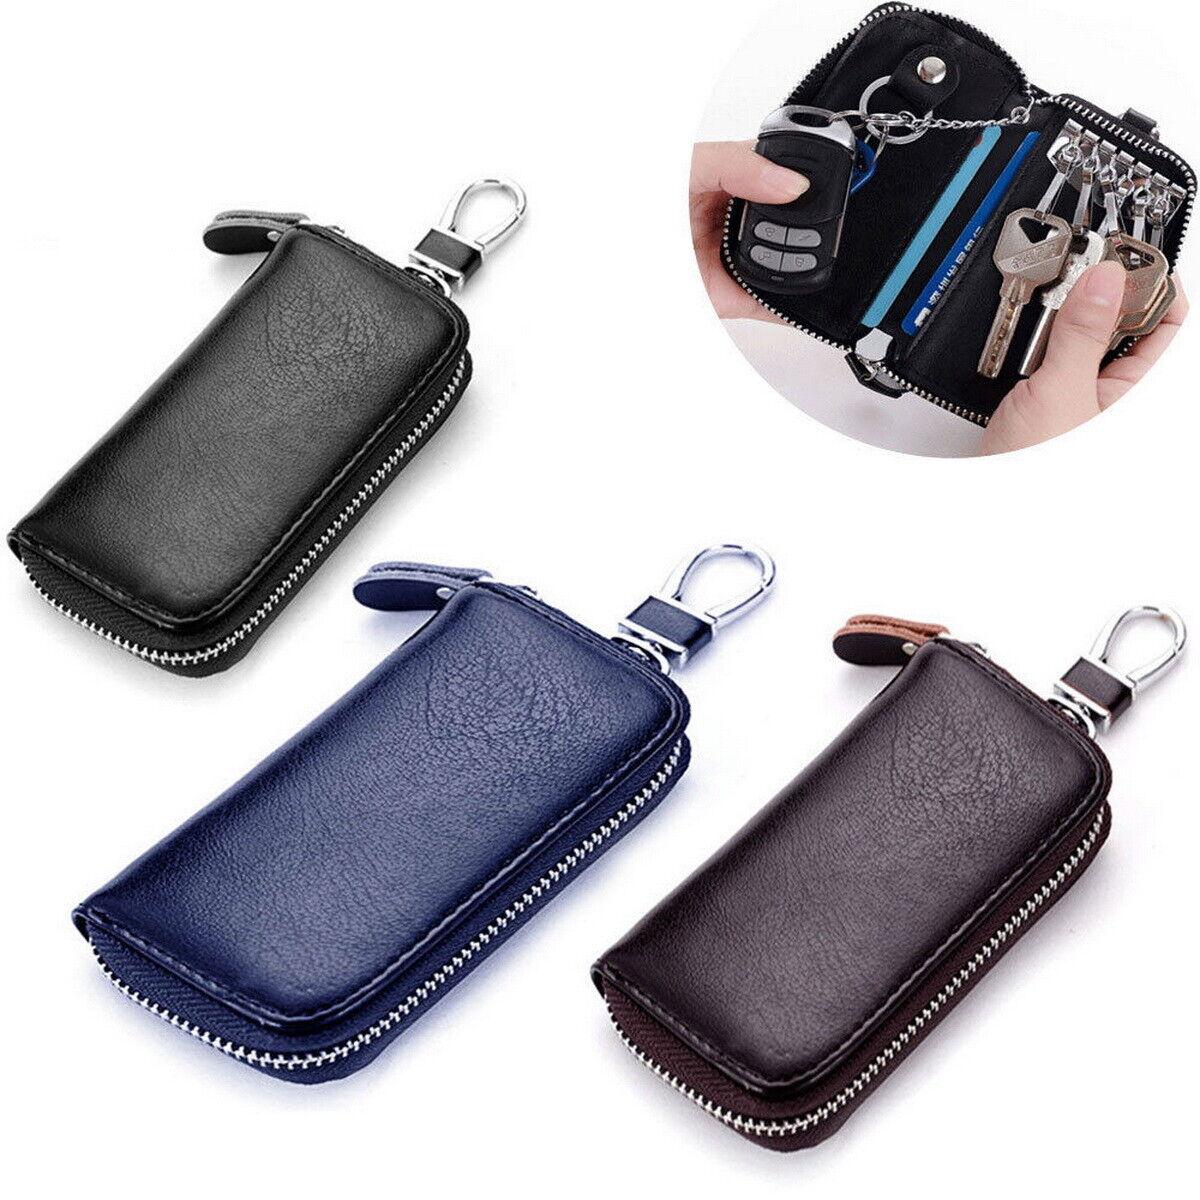 Genuine Leather Key Holder Case Keychain Pouch Bag Car Wallet Key Ring Unisex